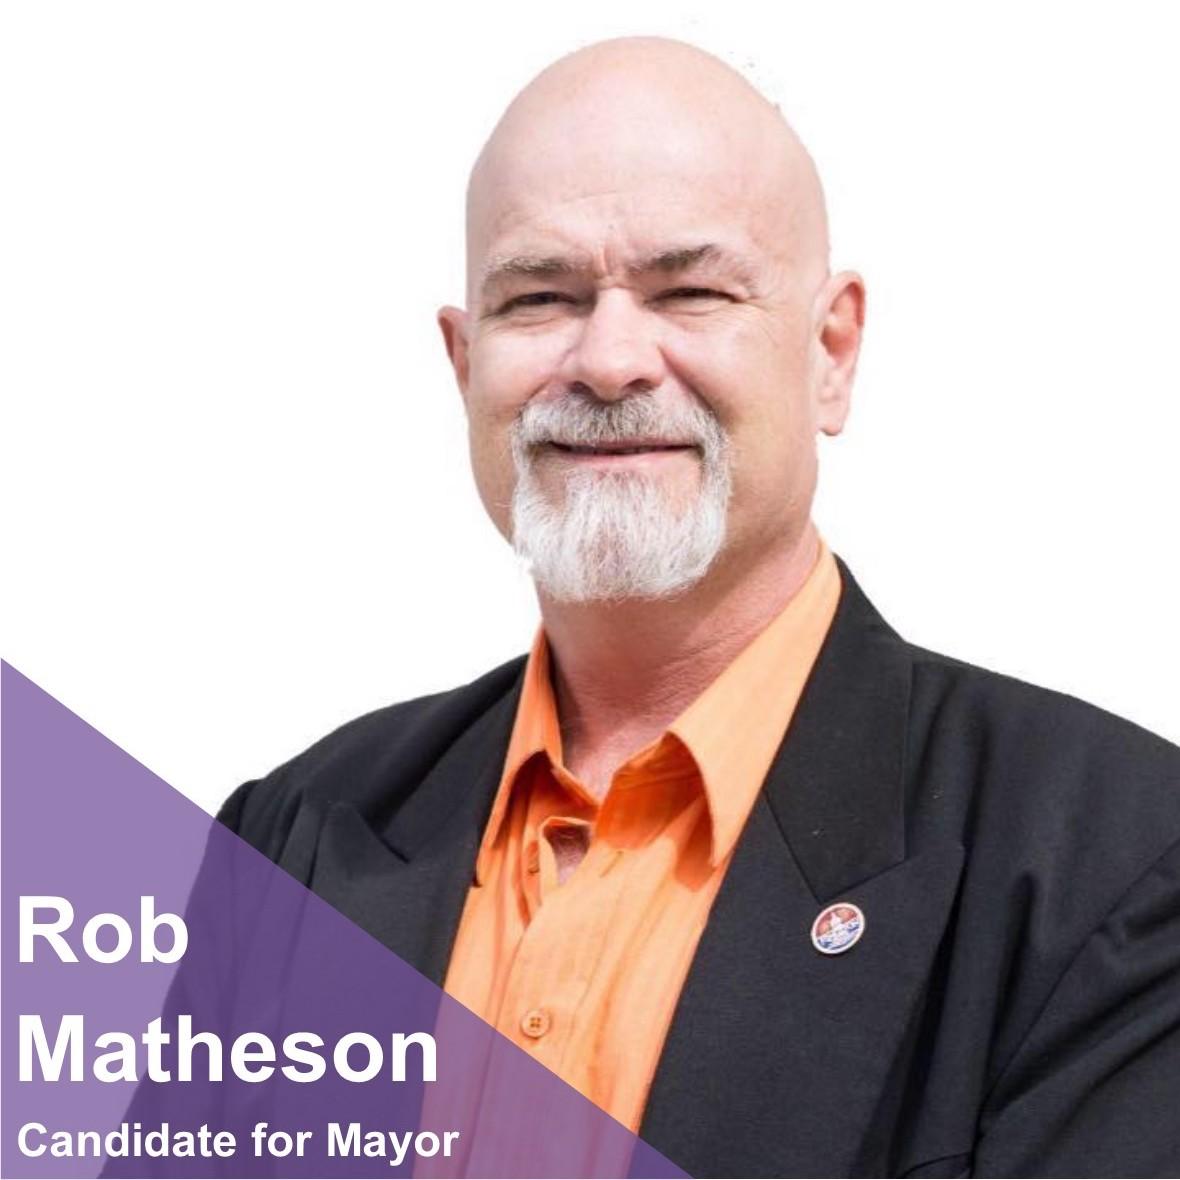 RobMathesonW2.jpg